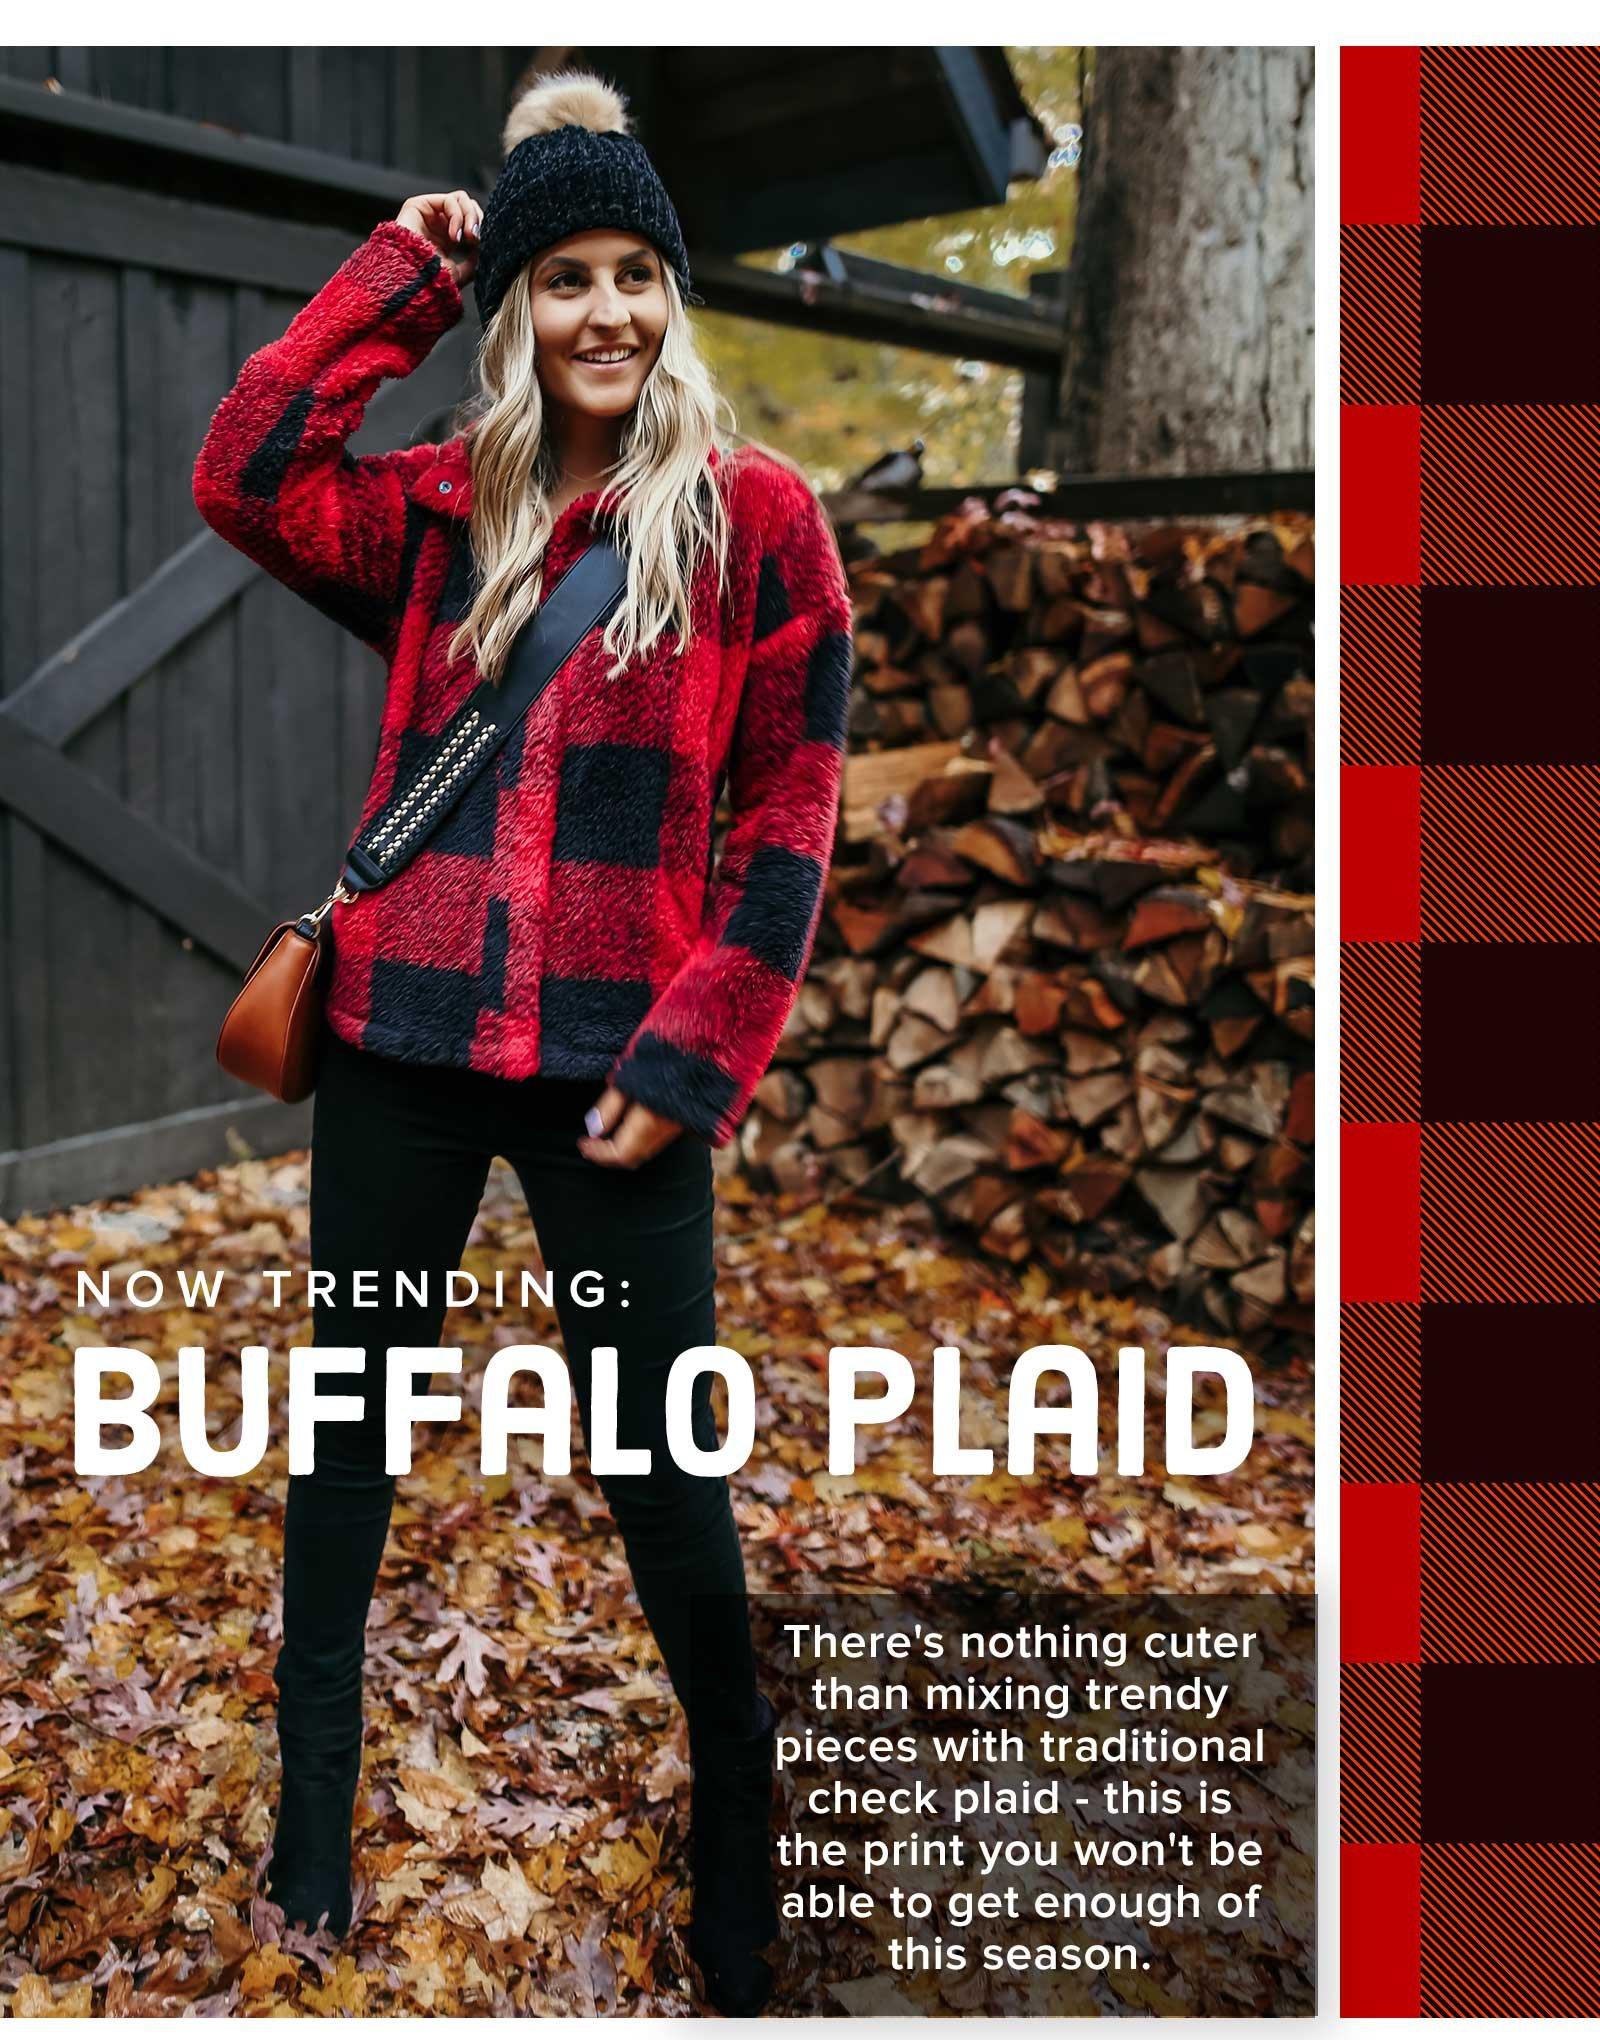 NOW TRENDING: BUFFALO PLAID